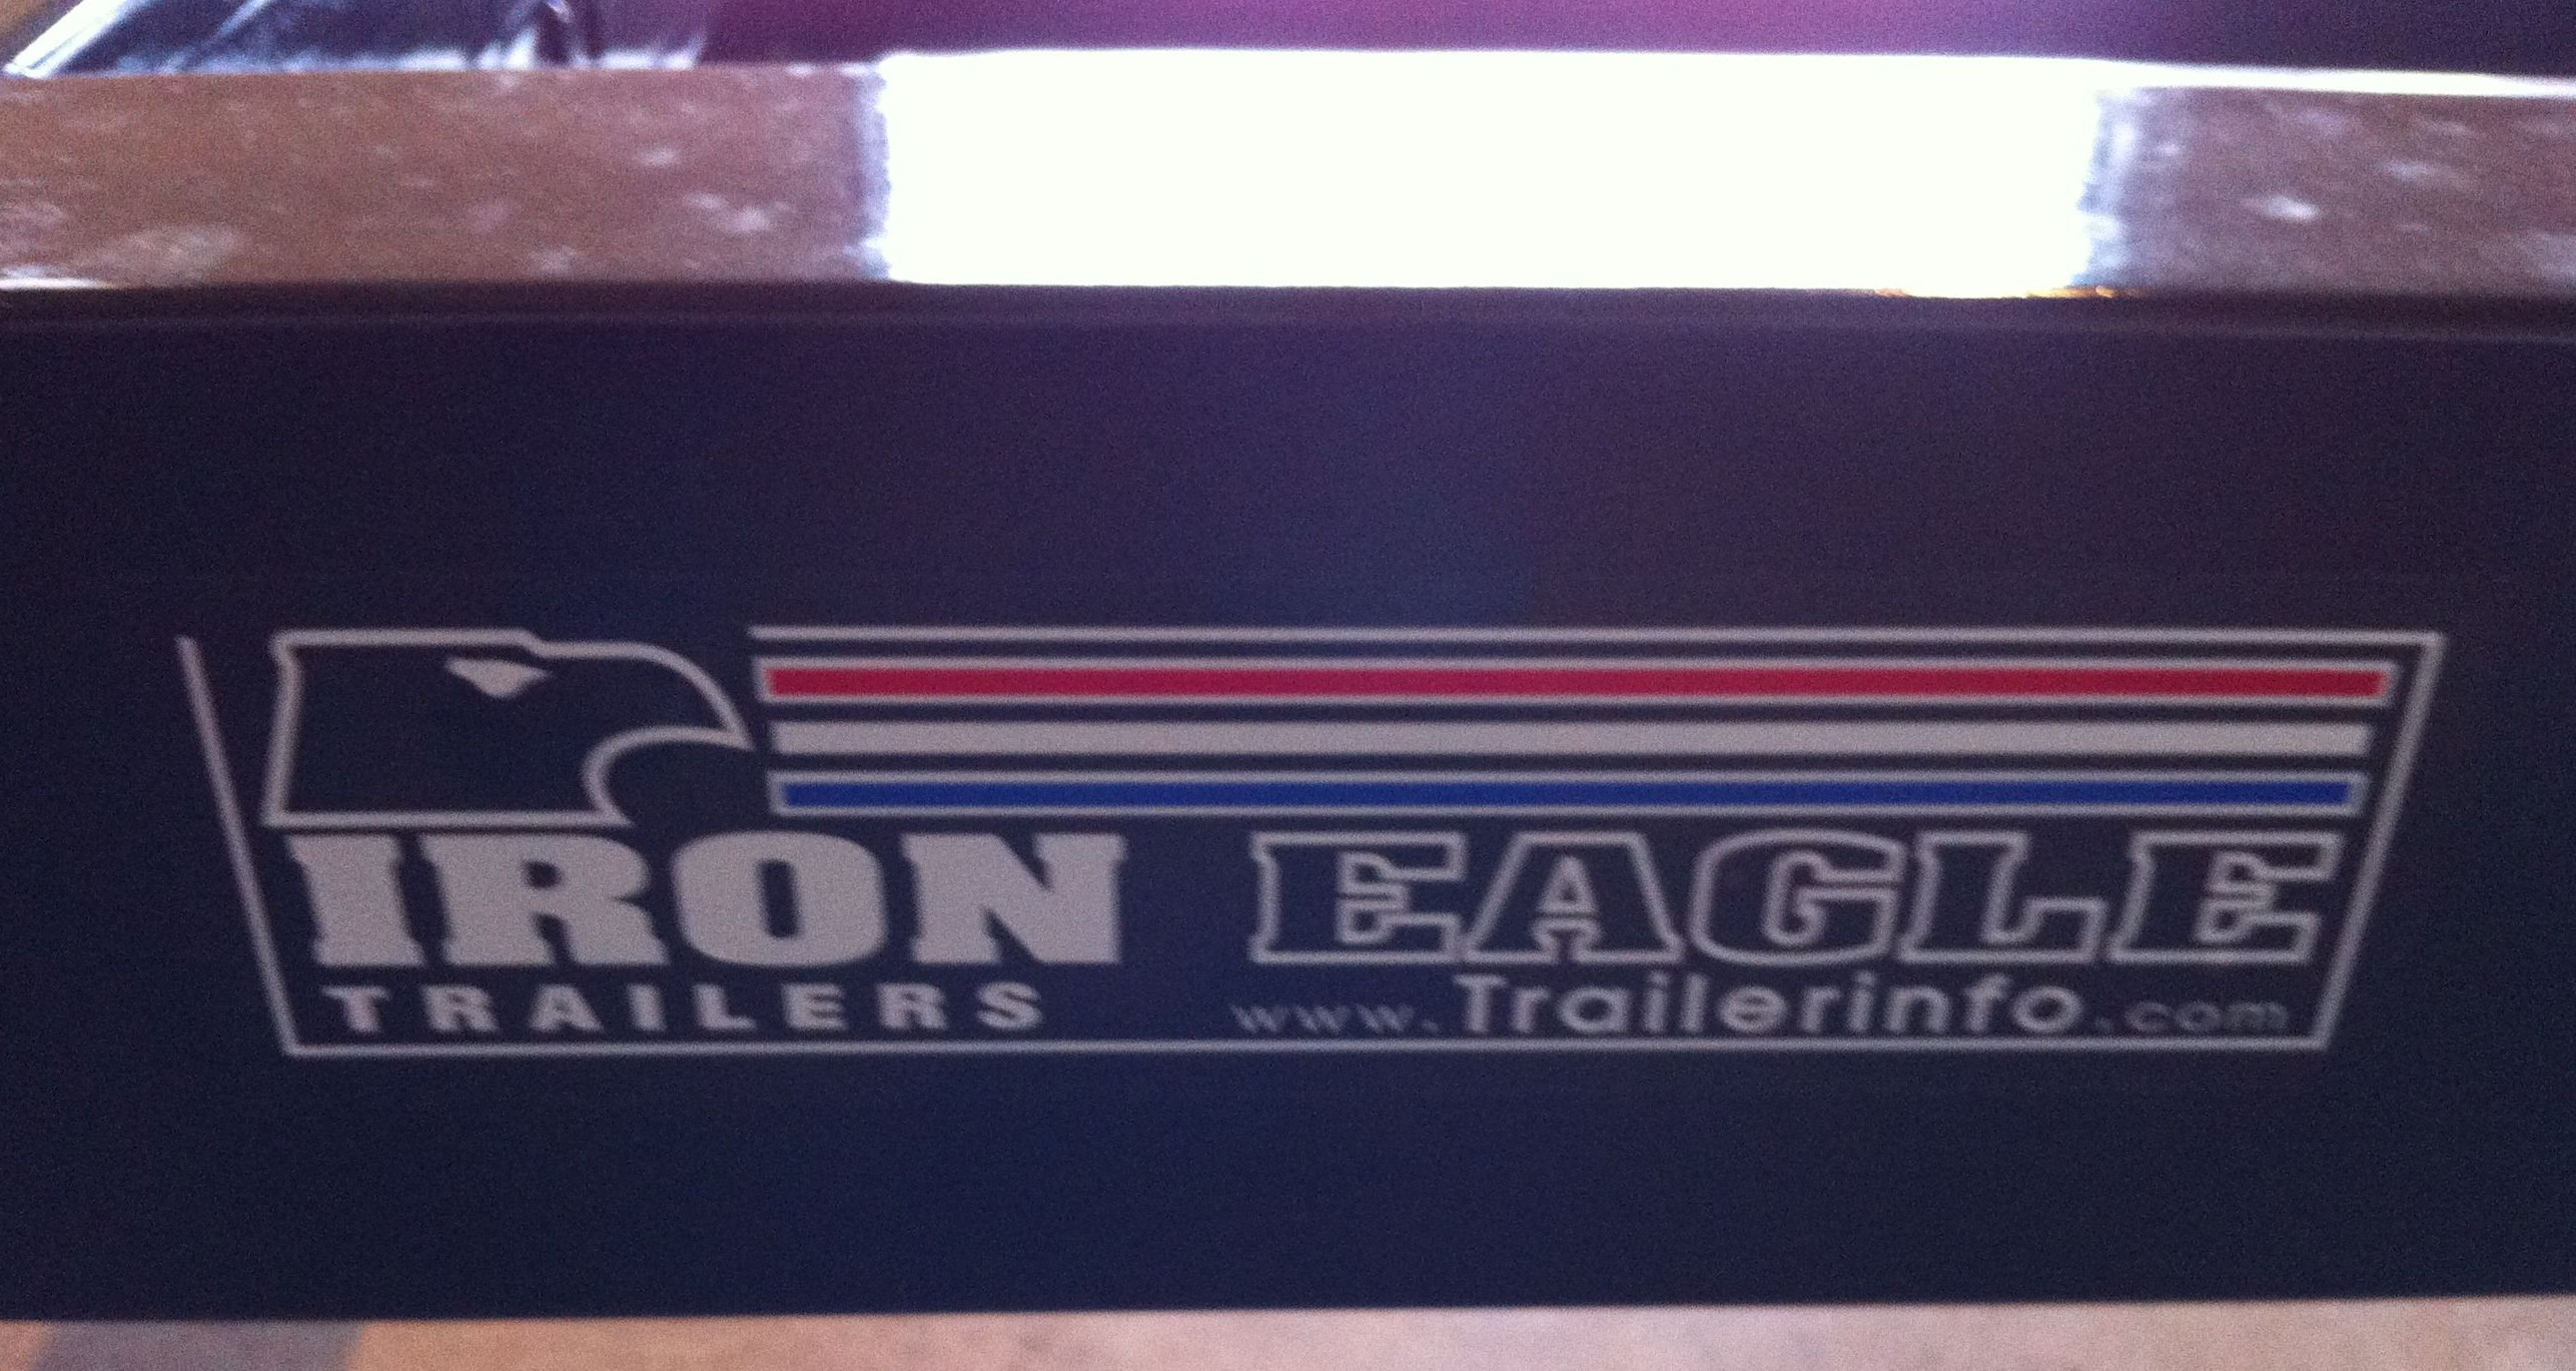 the eagle has landed the trailer comes home to roost naj haus rh najhaus com